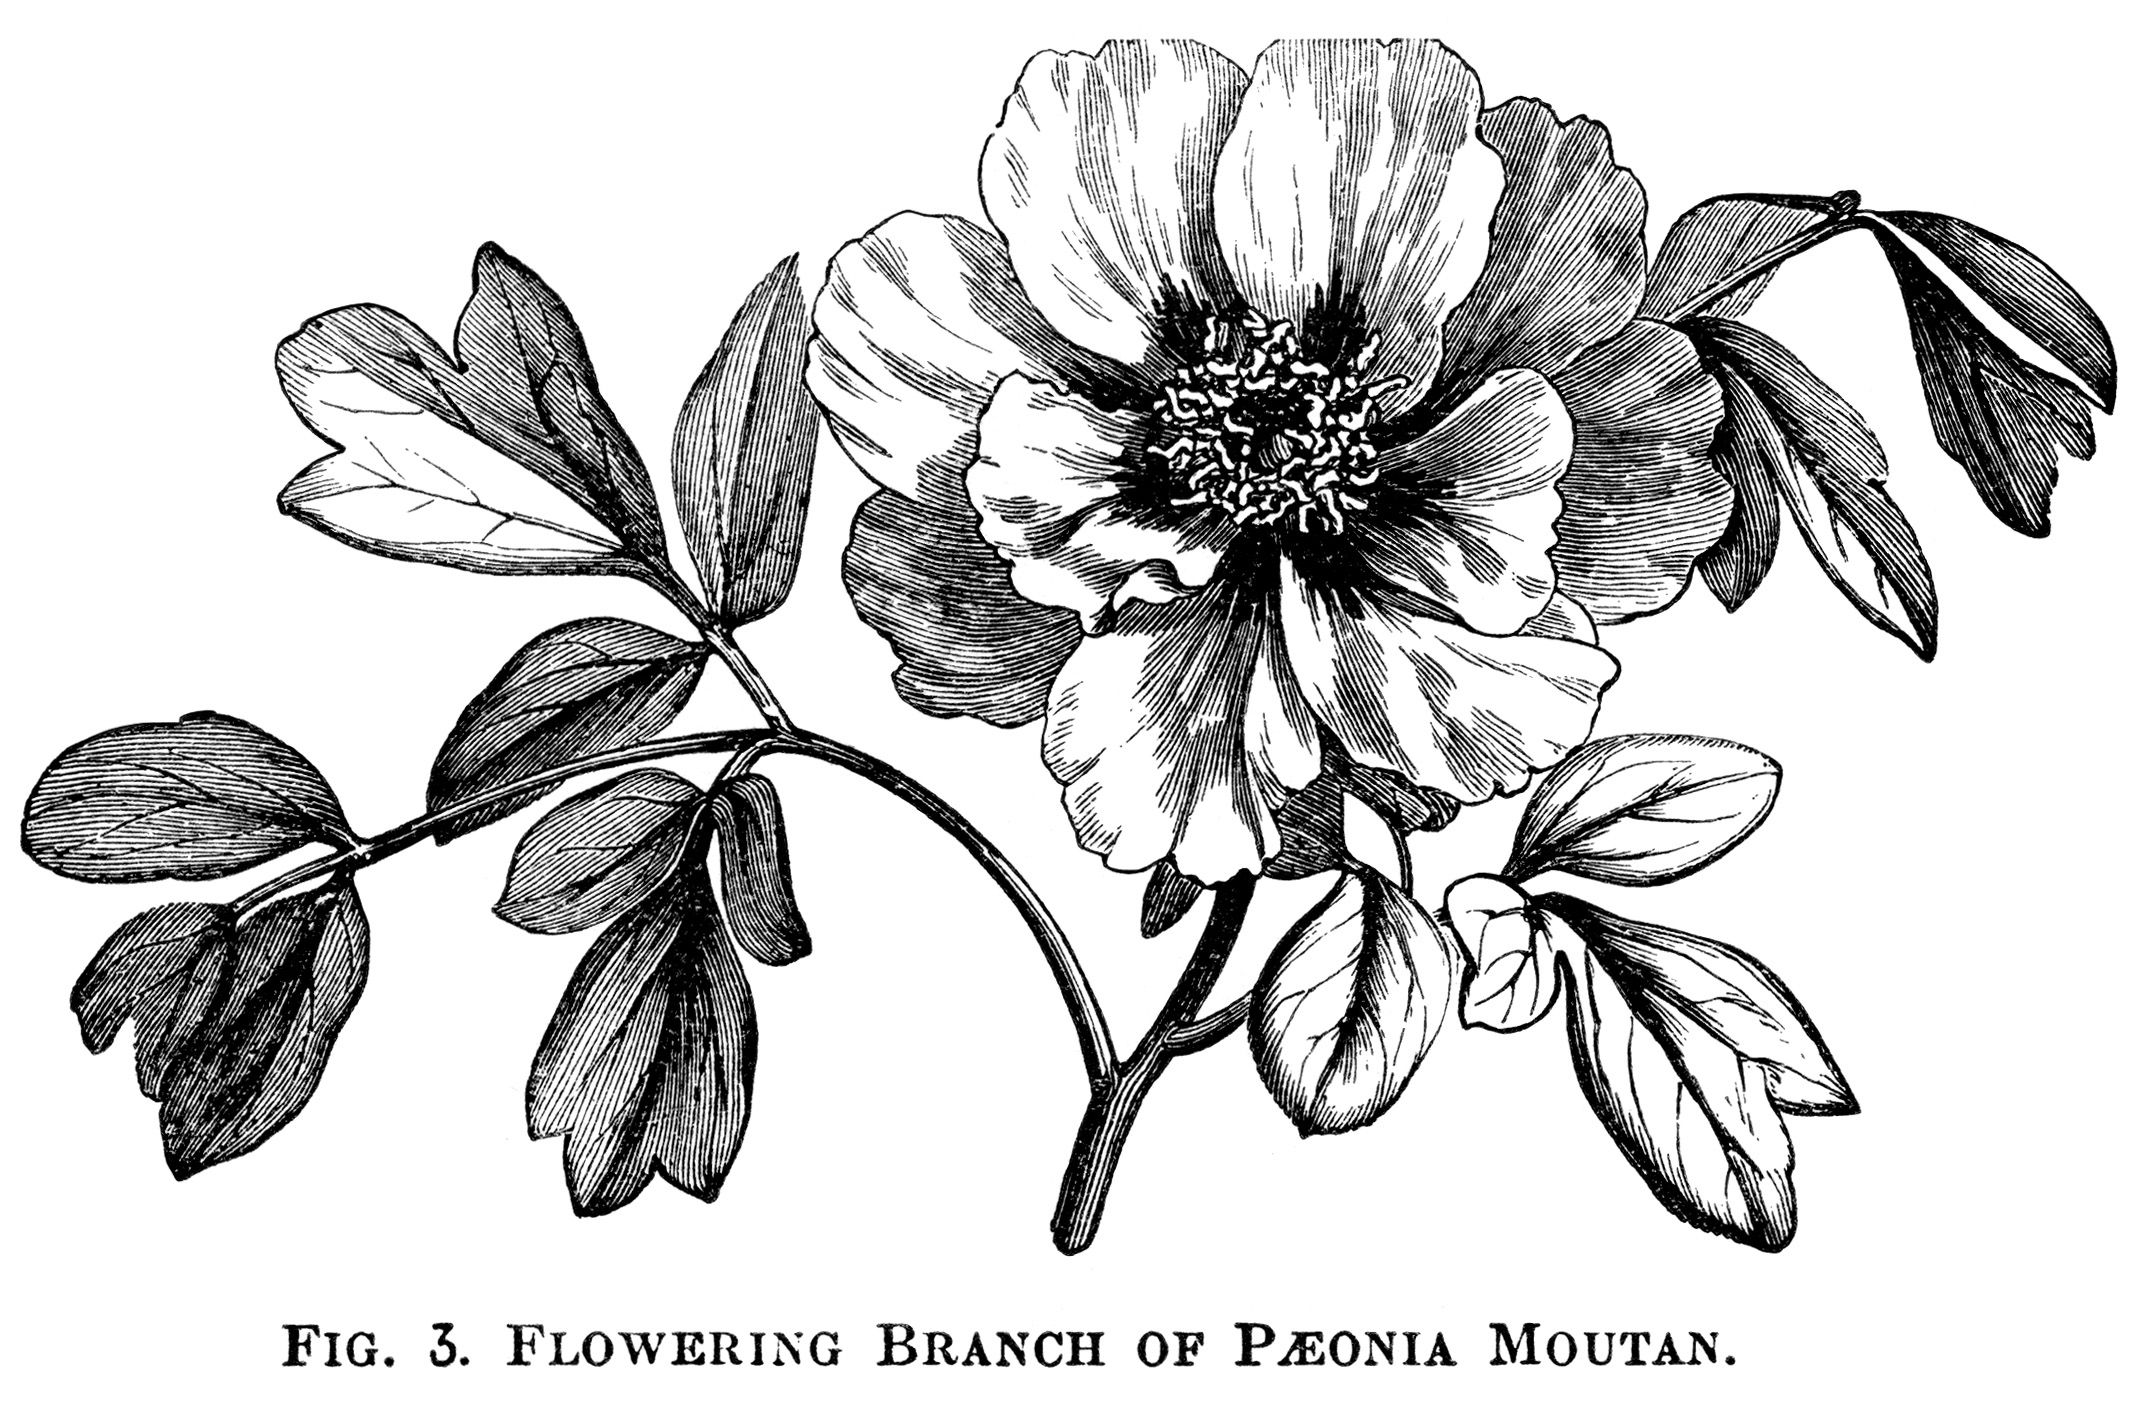 Moutan paeonia peony clip art botanical engraving black and white moutan paeonia peony clip art botanical engraving black and white clip art flower graphicvintage mightylinksfo